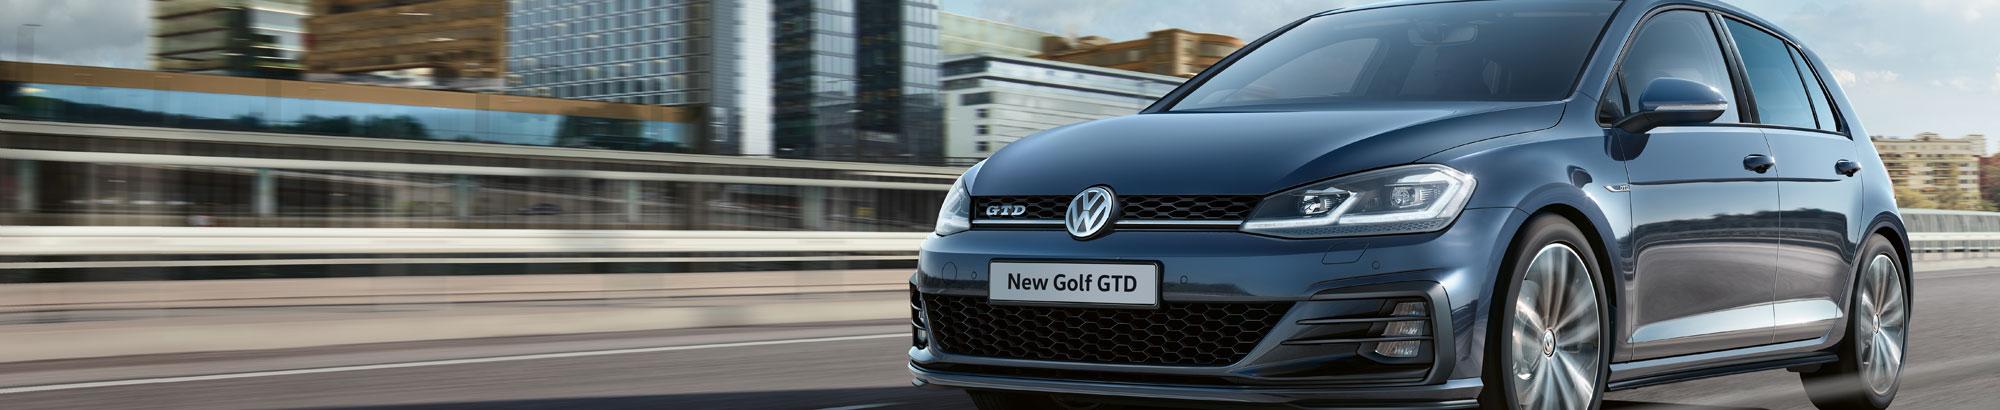 VW Engines | Car Engines | Volkswagen UK